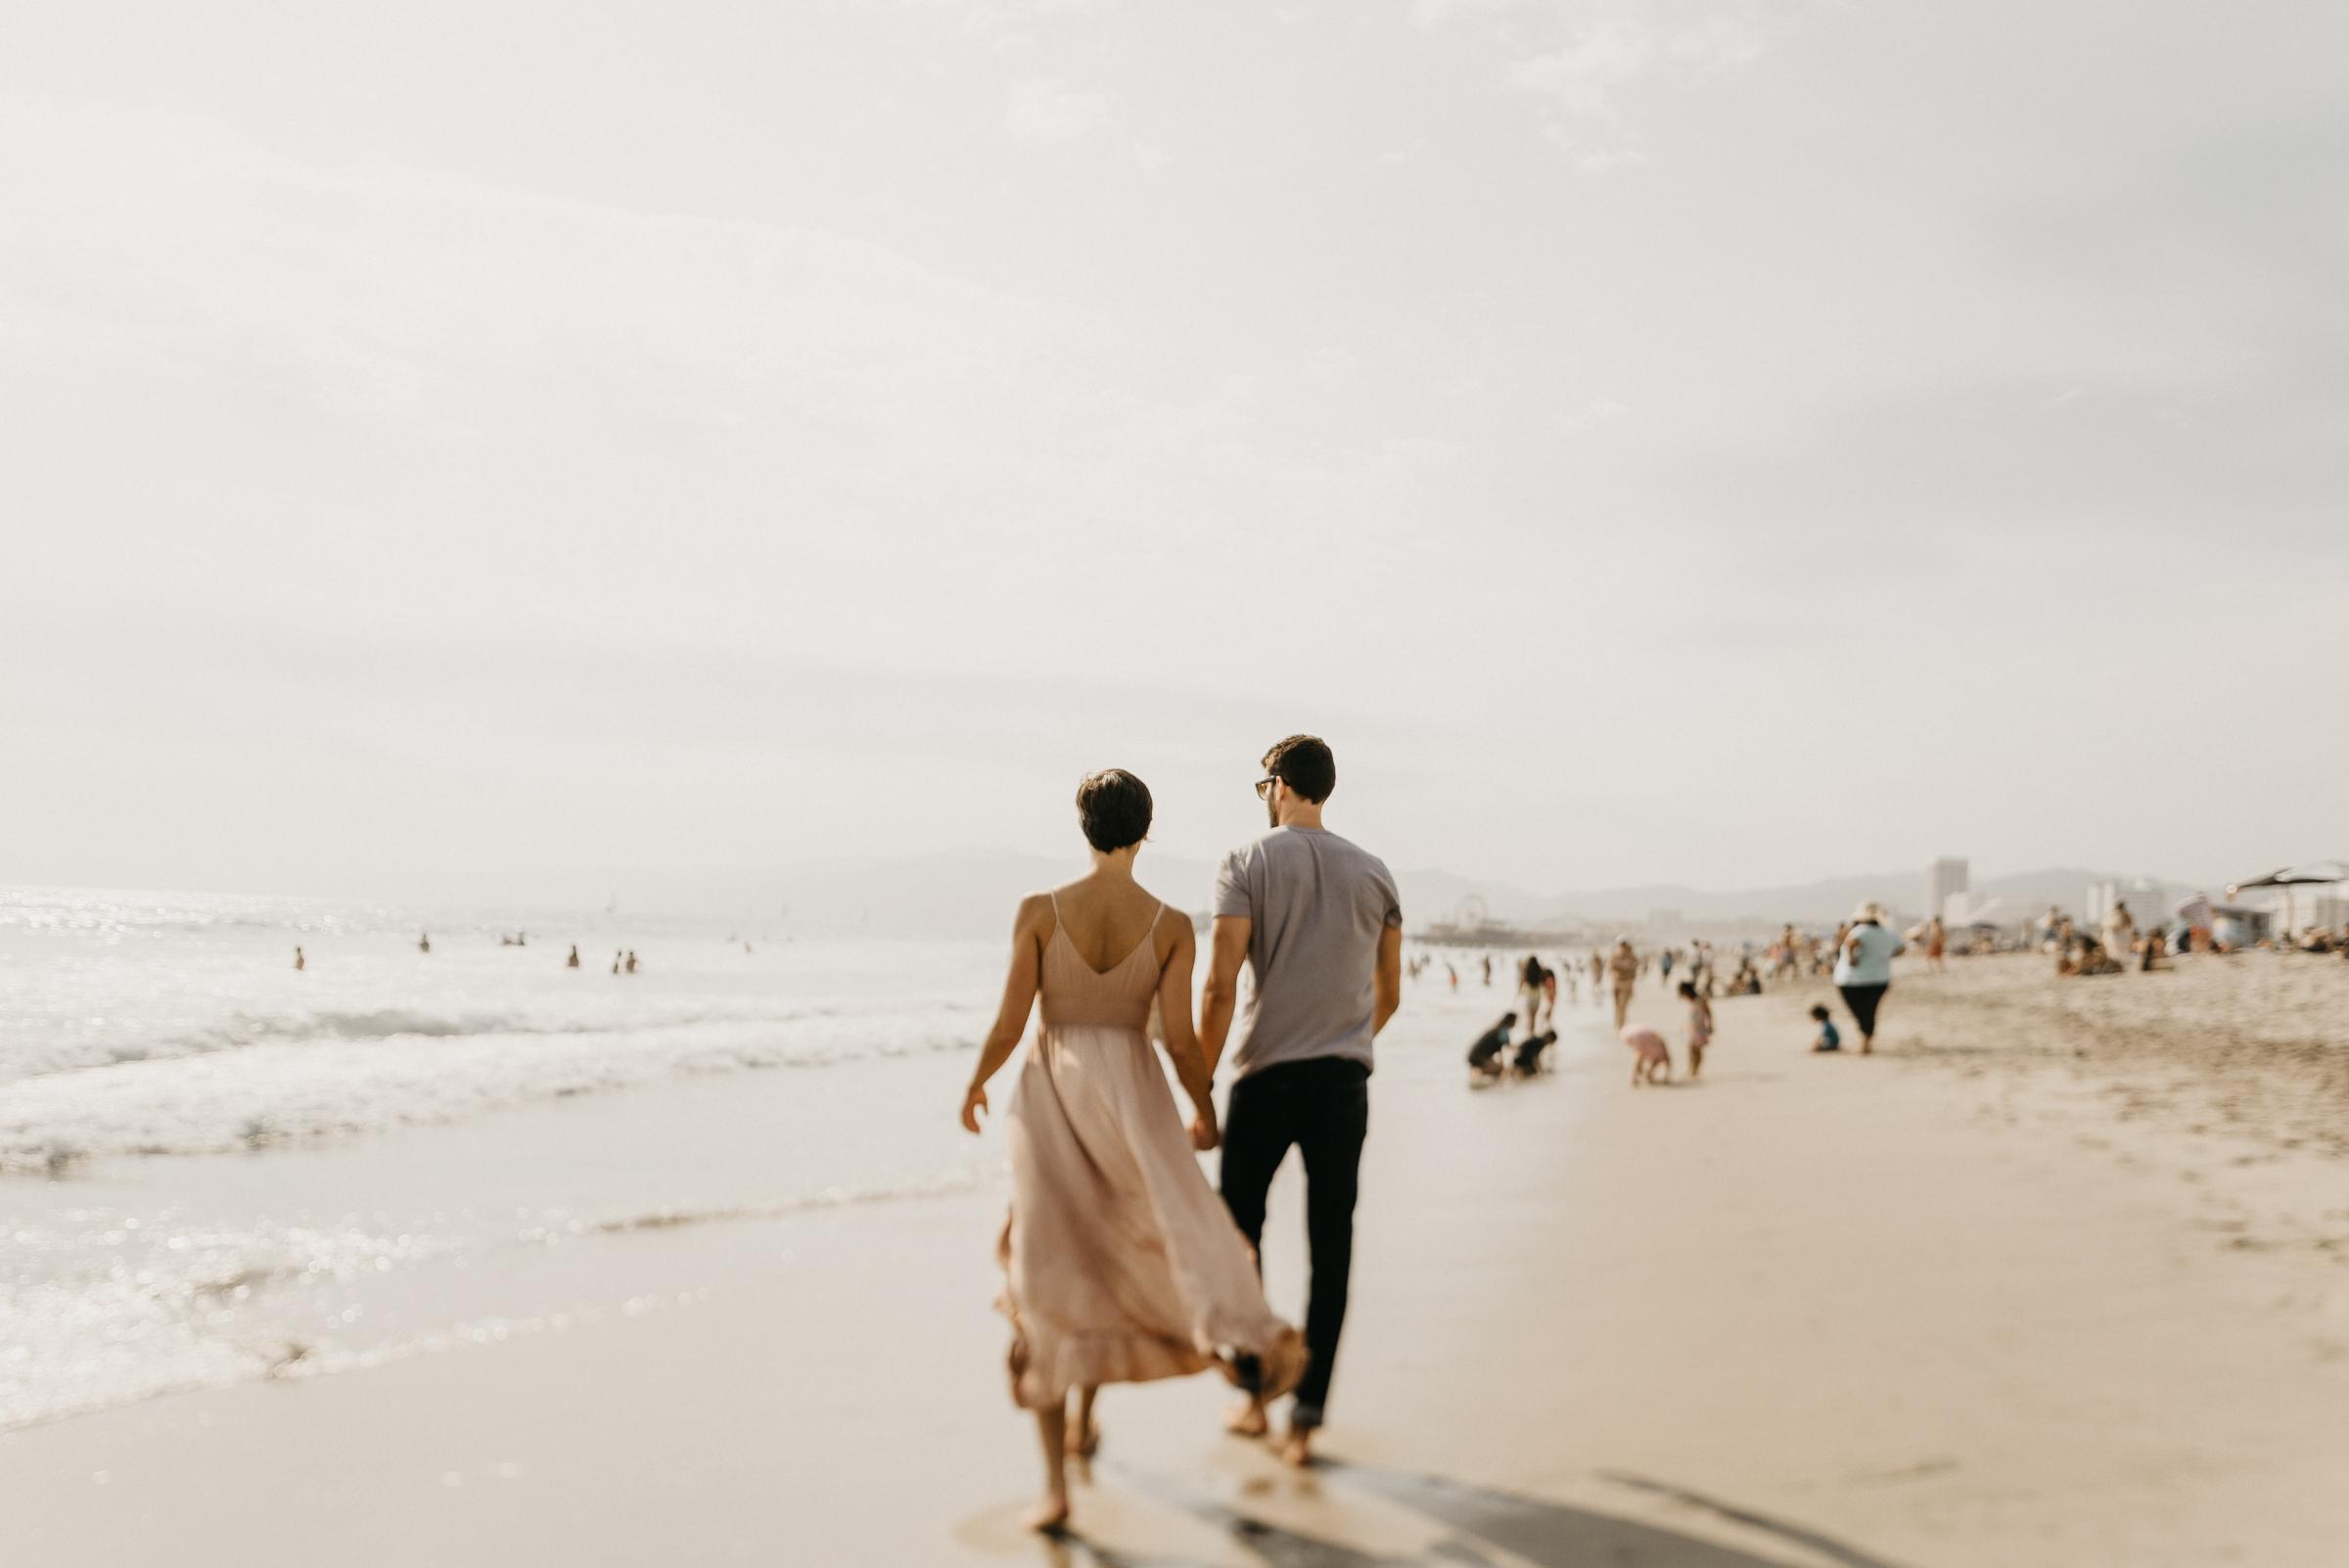 Isaiah + Taylor Photography - Venice Beach & Santa Monica Engagement Session, Los Angeles Wedding Photographer-053.jpg